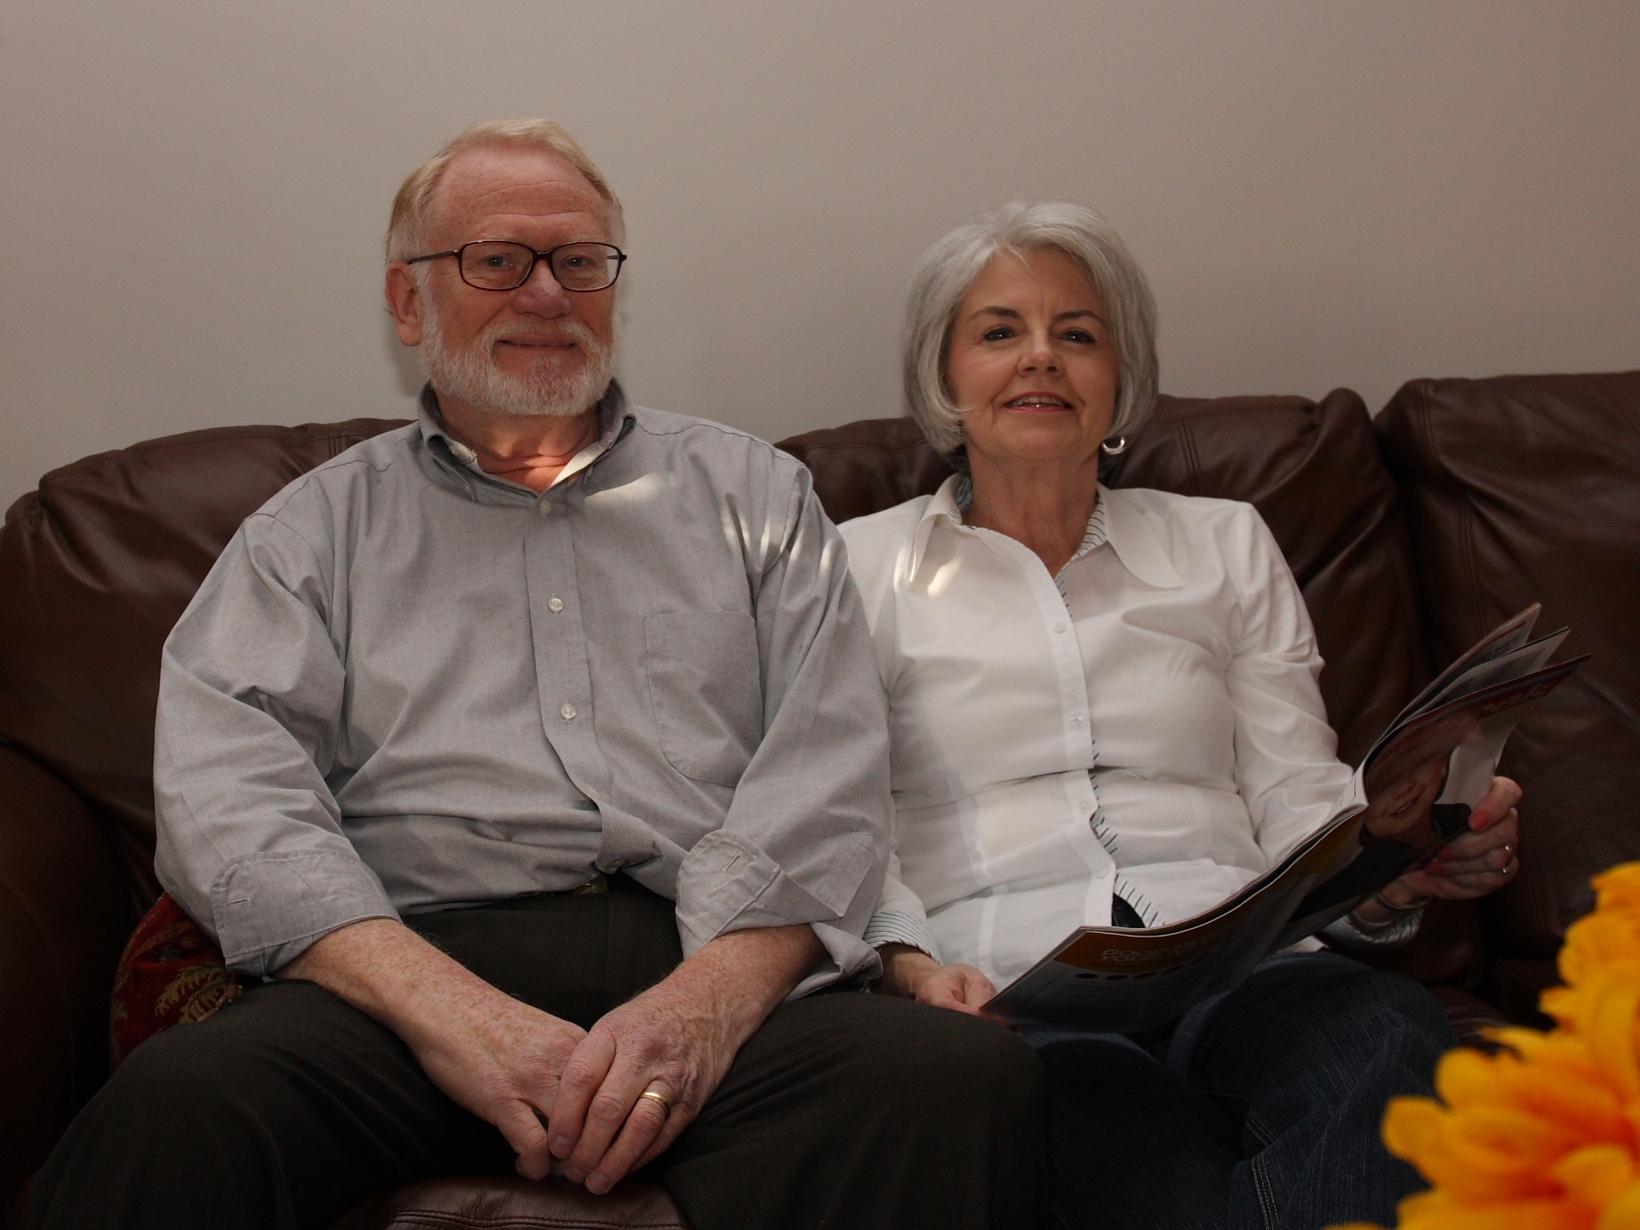 Glenna & Bernie from Middletown, Ohio, United States